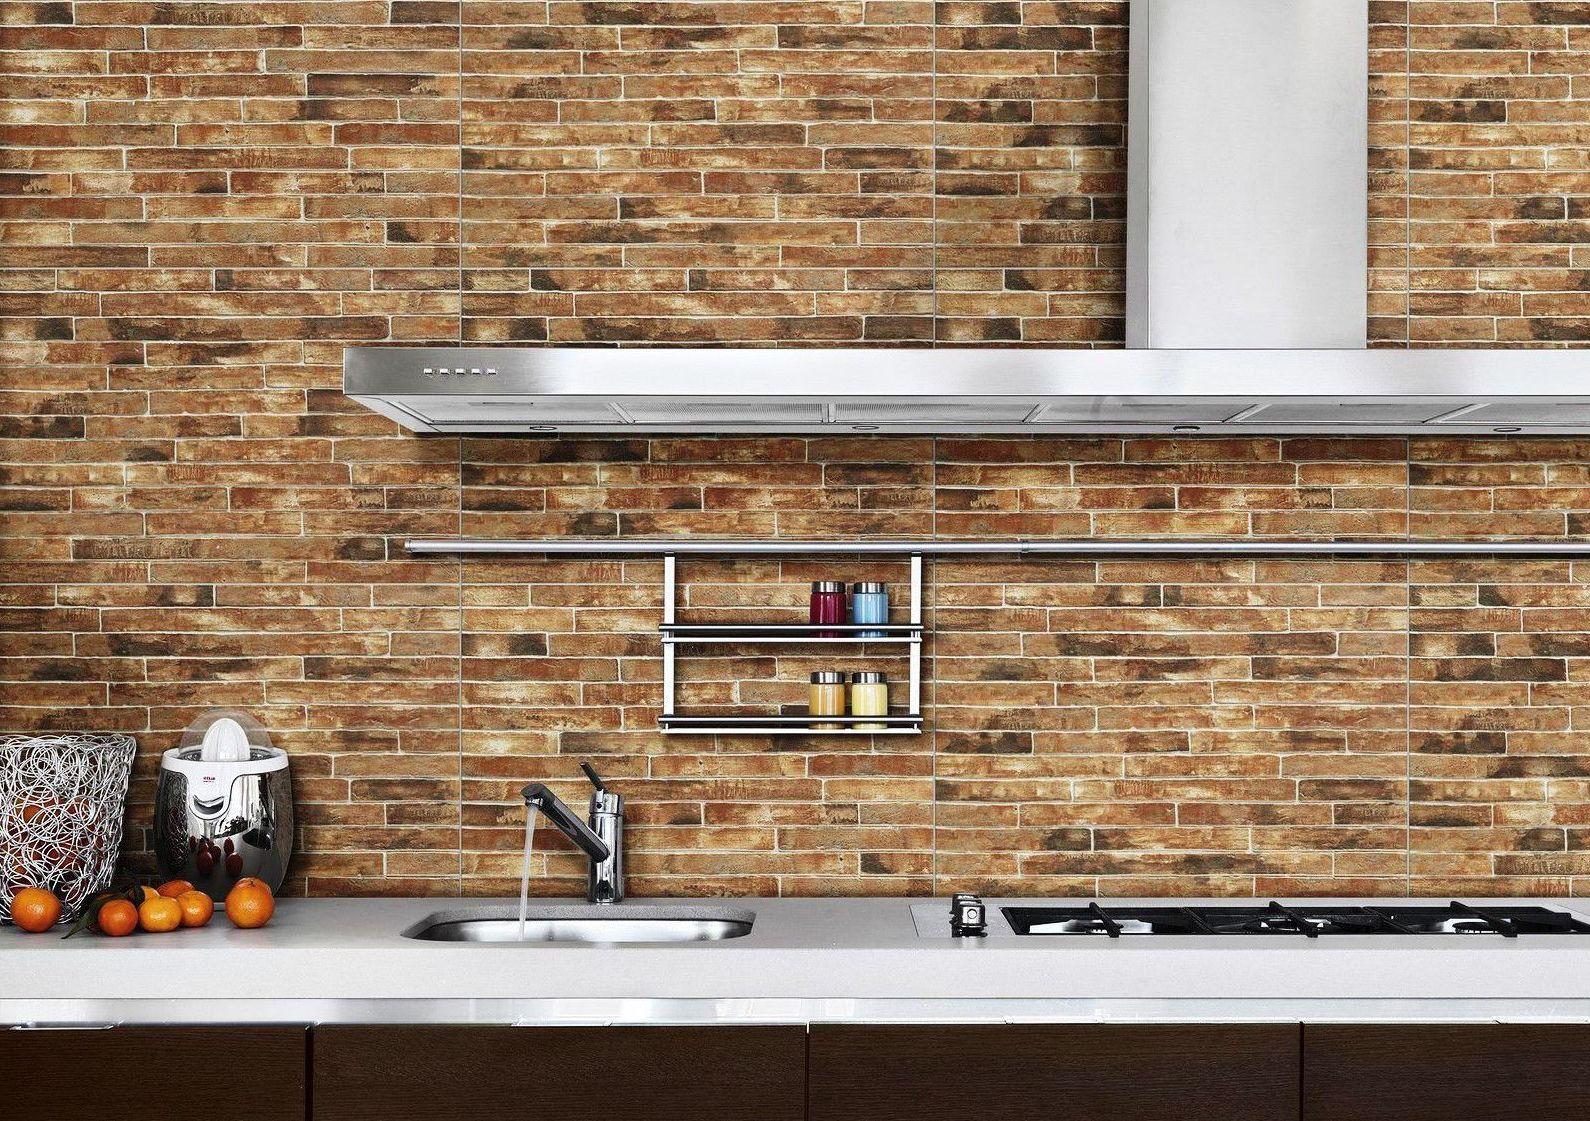 Brick Effect Kitchen Wall Tiles | Kitchens | Pinterest | Wall tiles ...